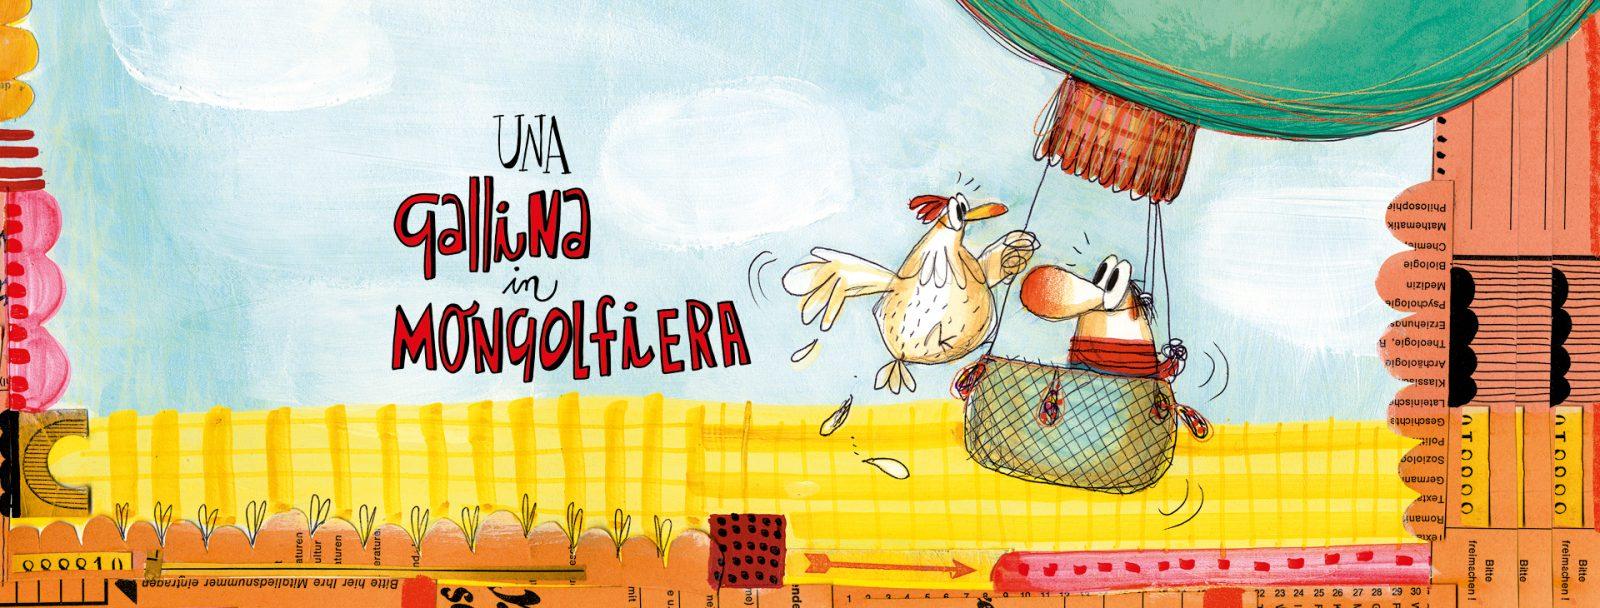 una gallina in mongolfiera